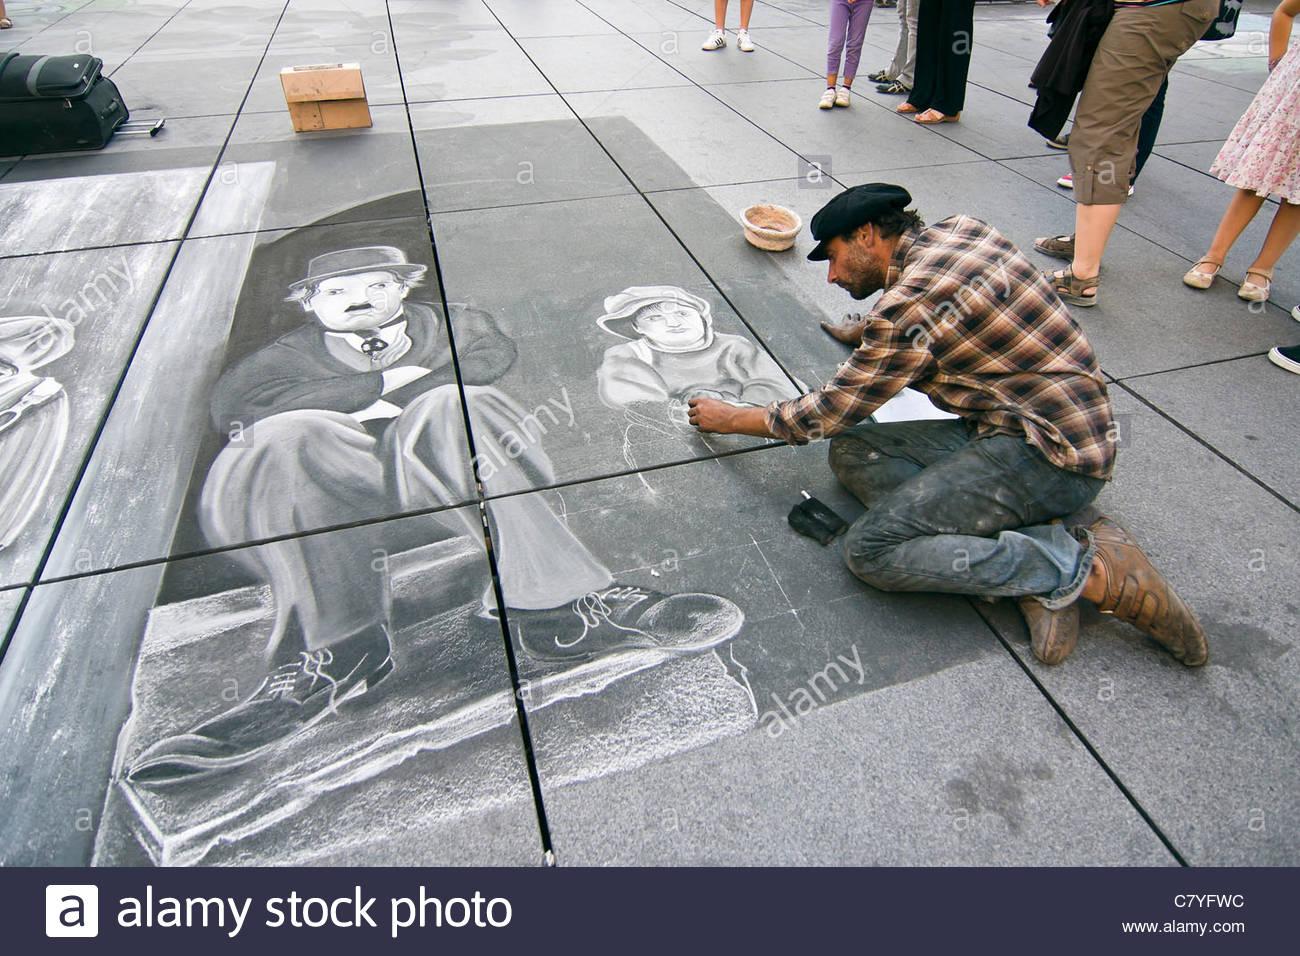 1300x956 A Street Artist Drawing Charlie Chaplin On The Sidewalk With Chalk